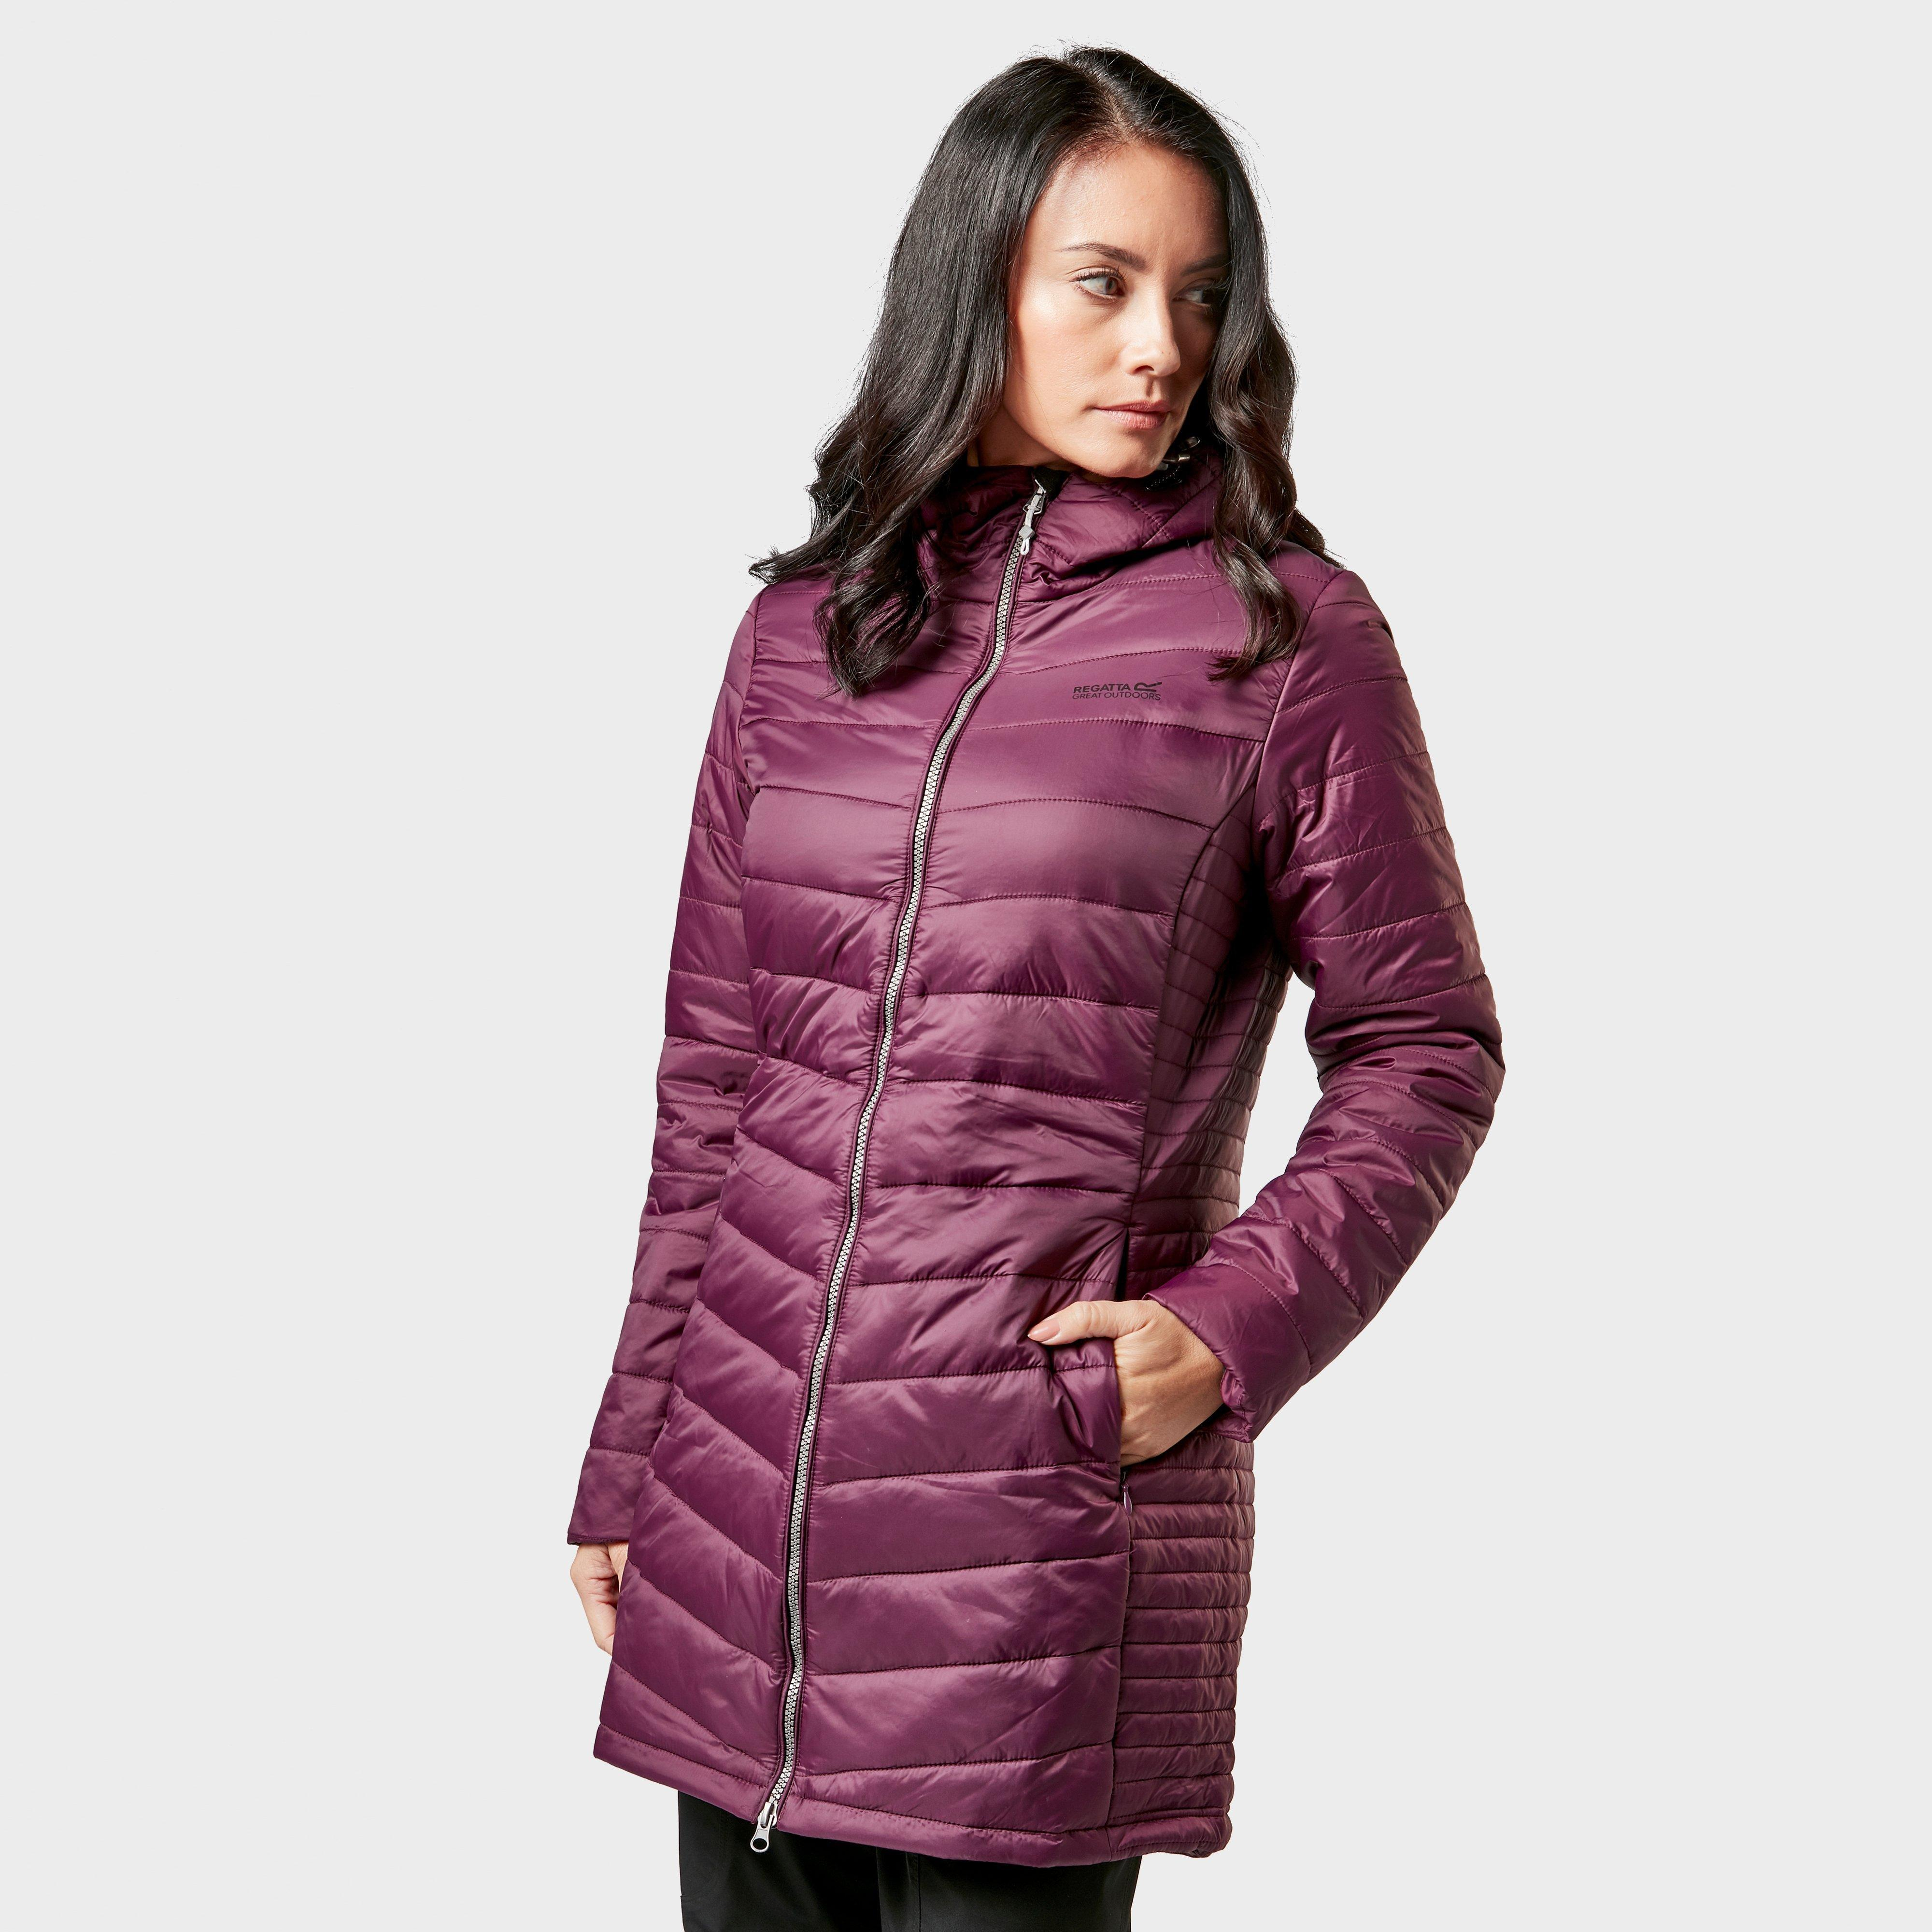 Regatta Regatta Womens Beaudine Long Baffle Jacket - N/A, N/A